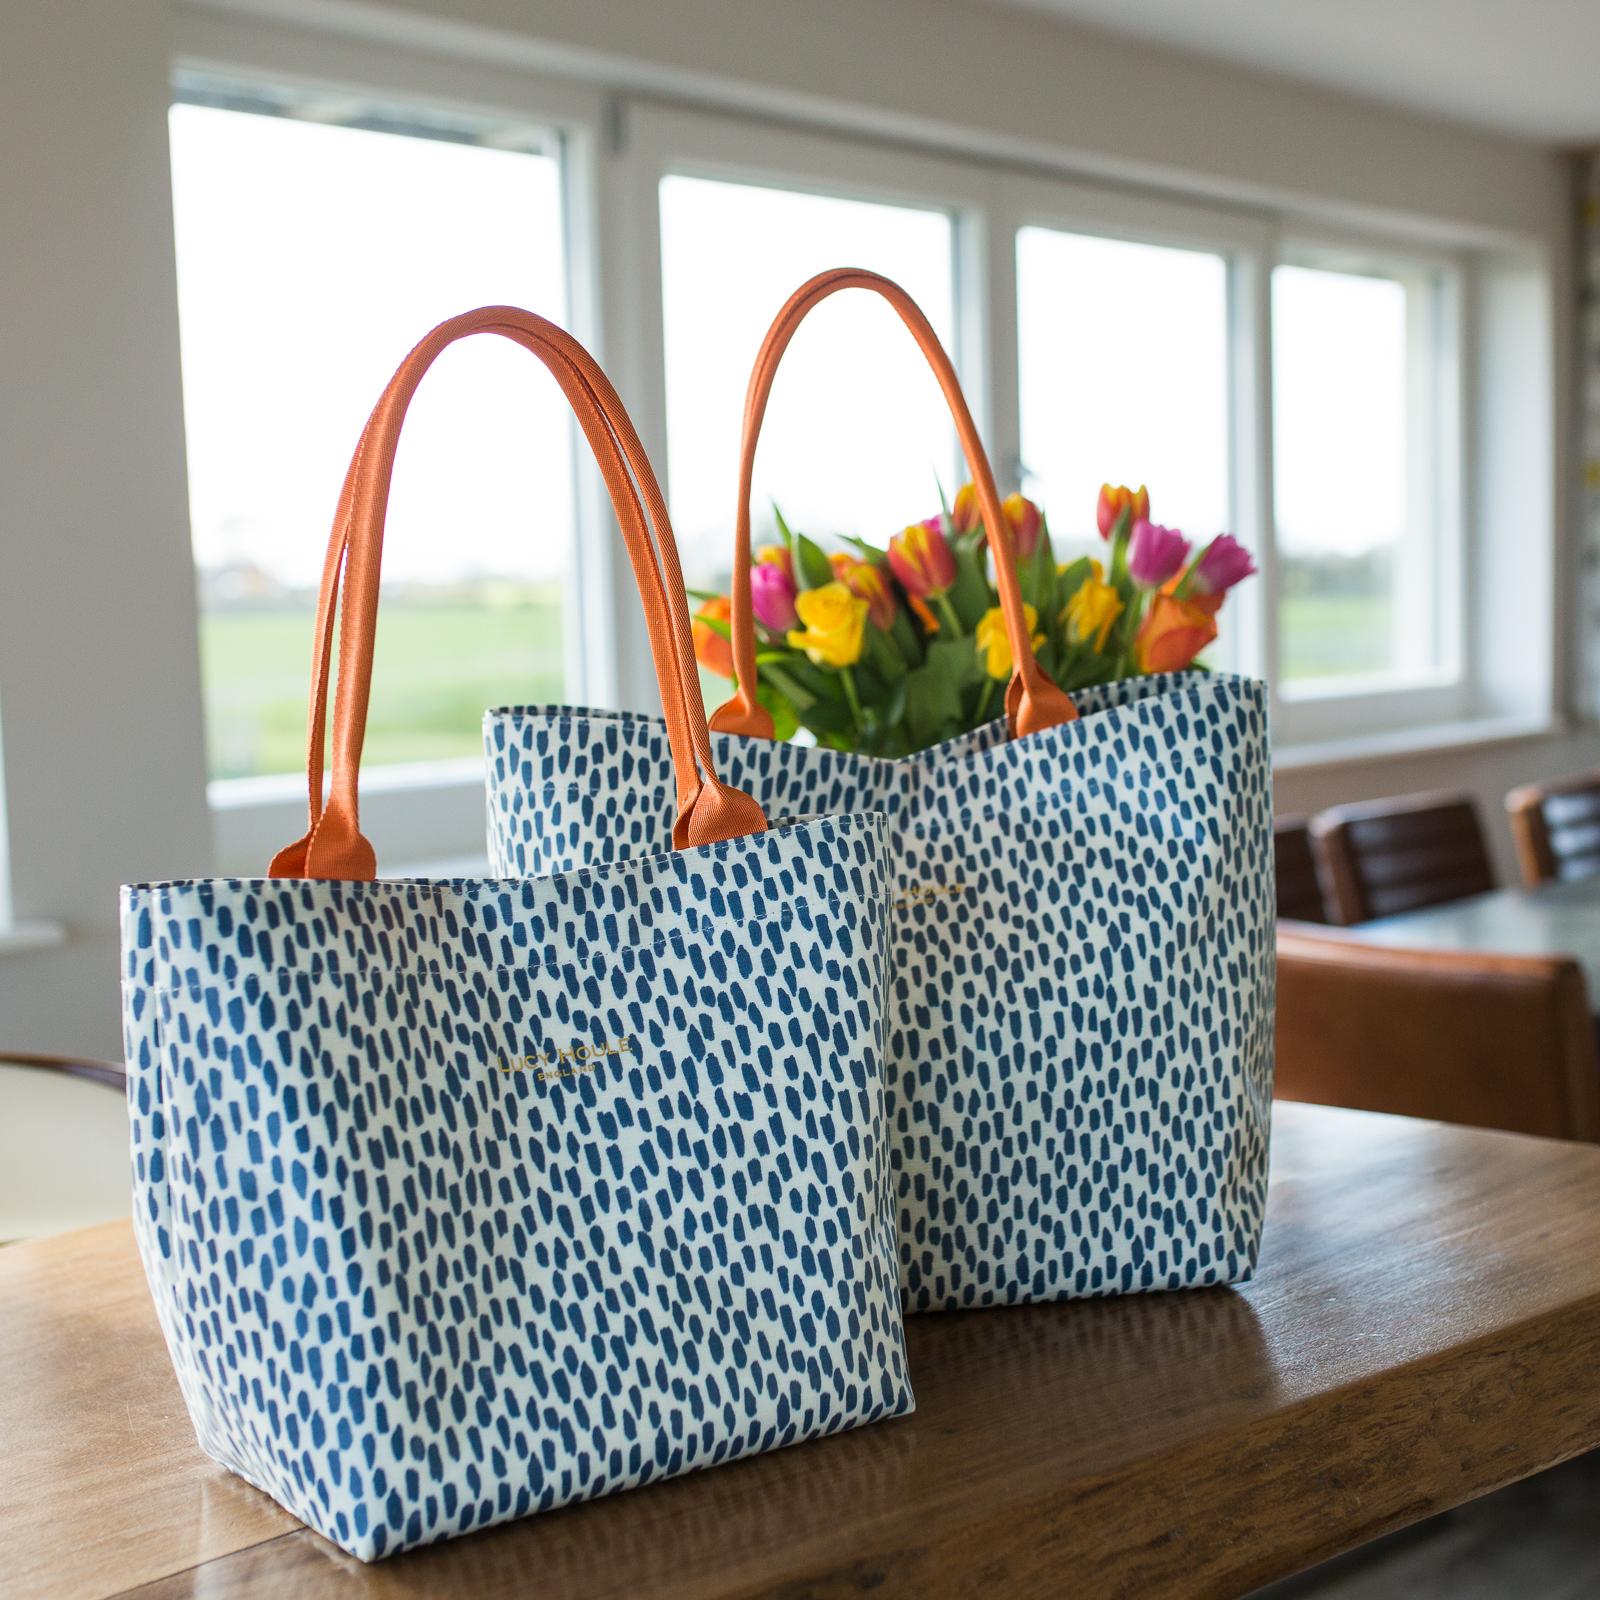 Navy Cobblestone Medium Tote Bag with Orange Handles